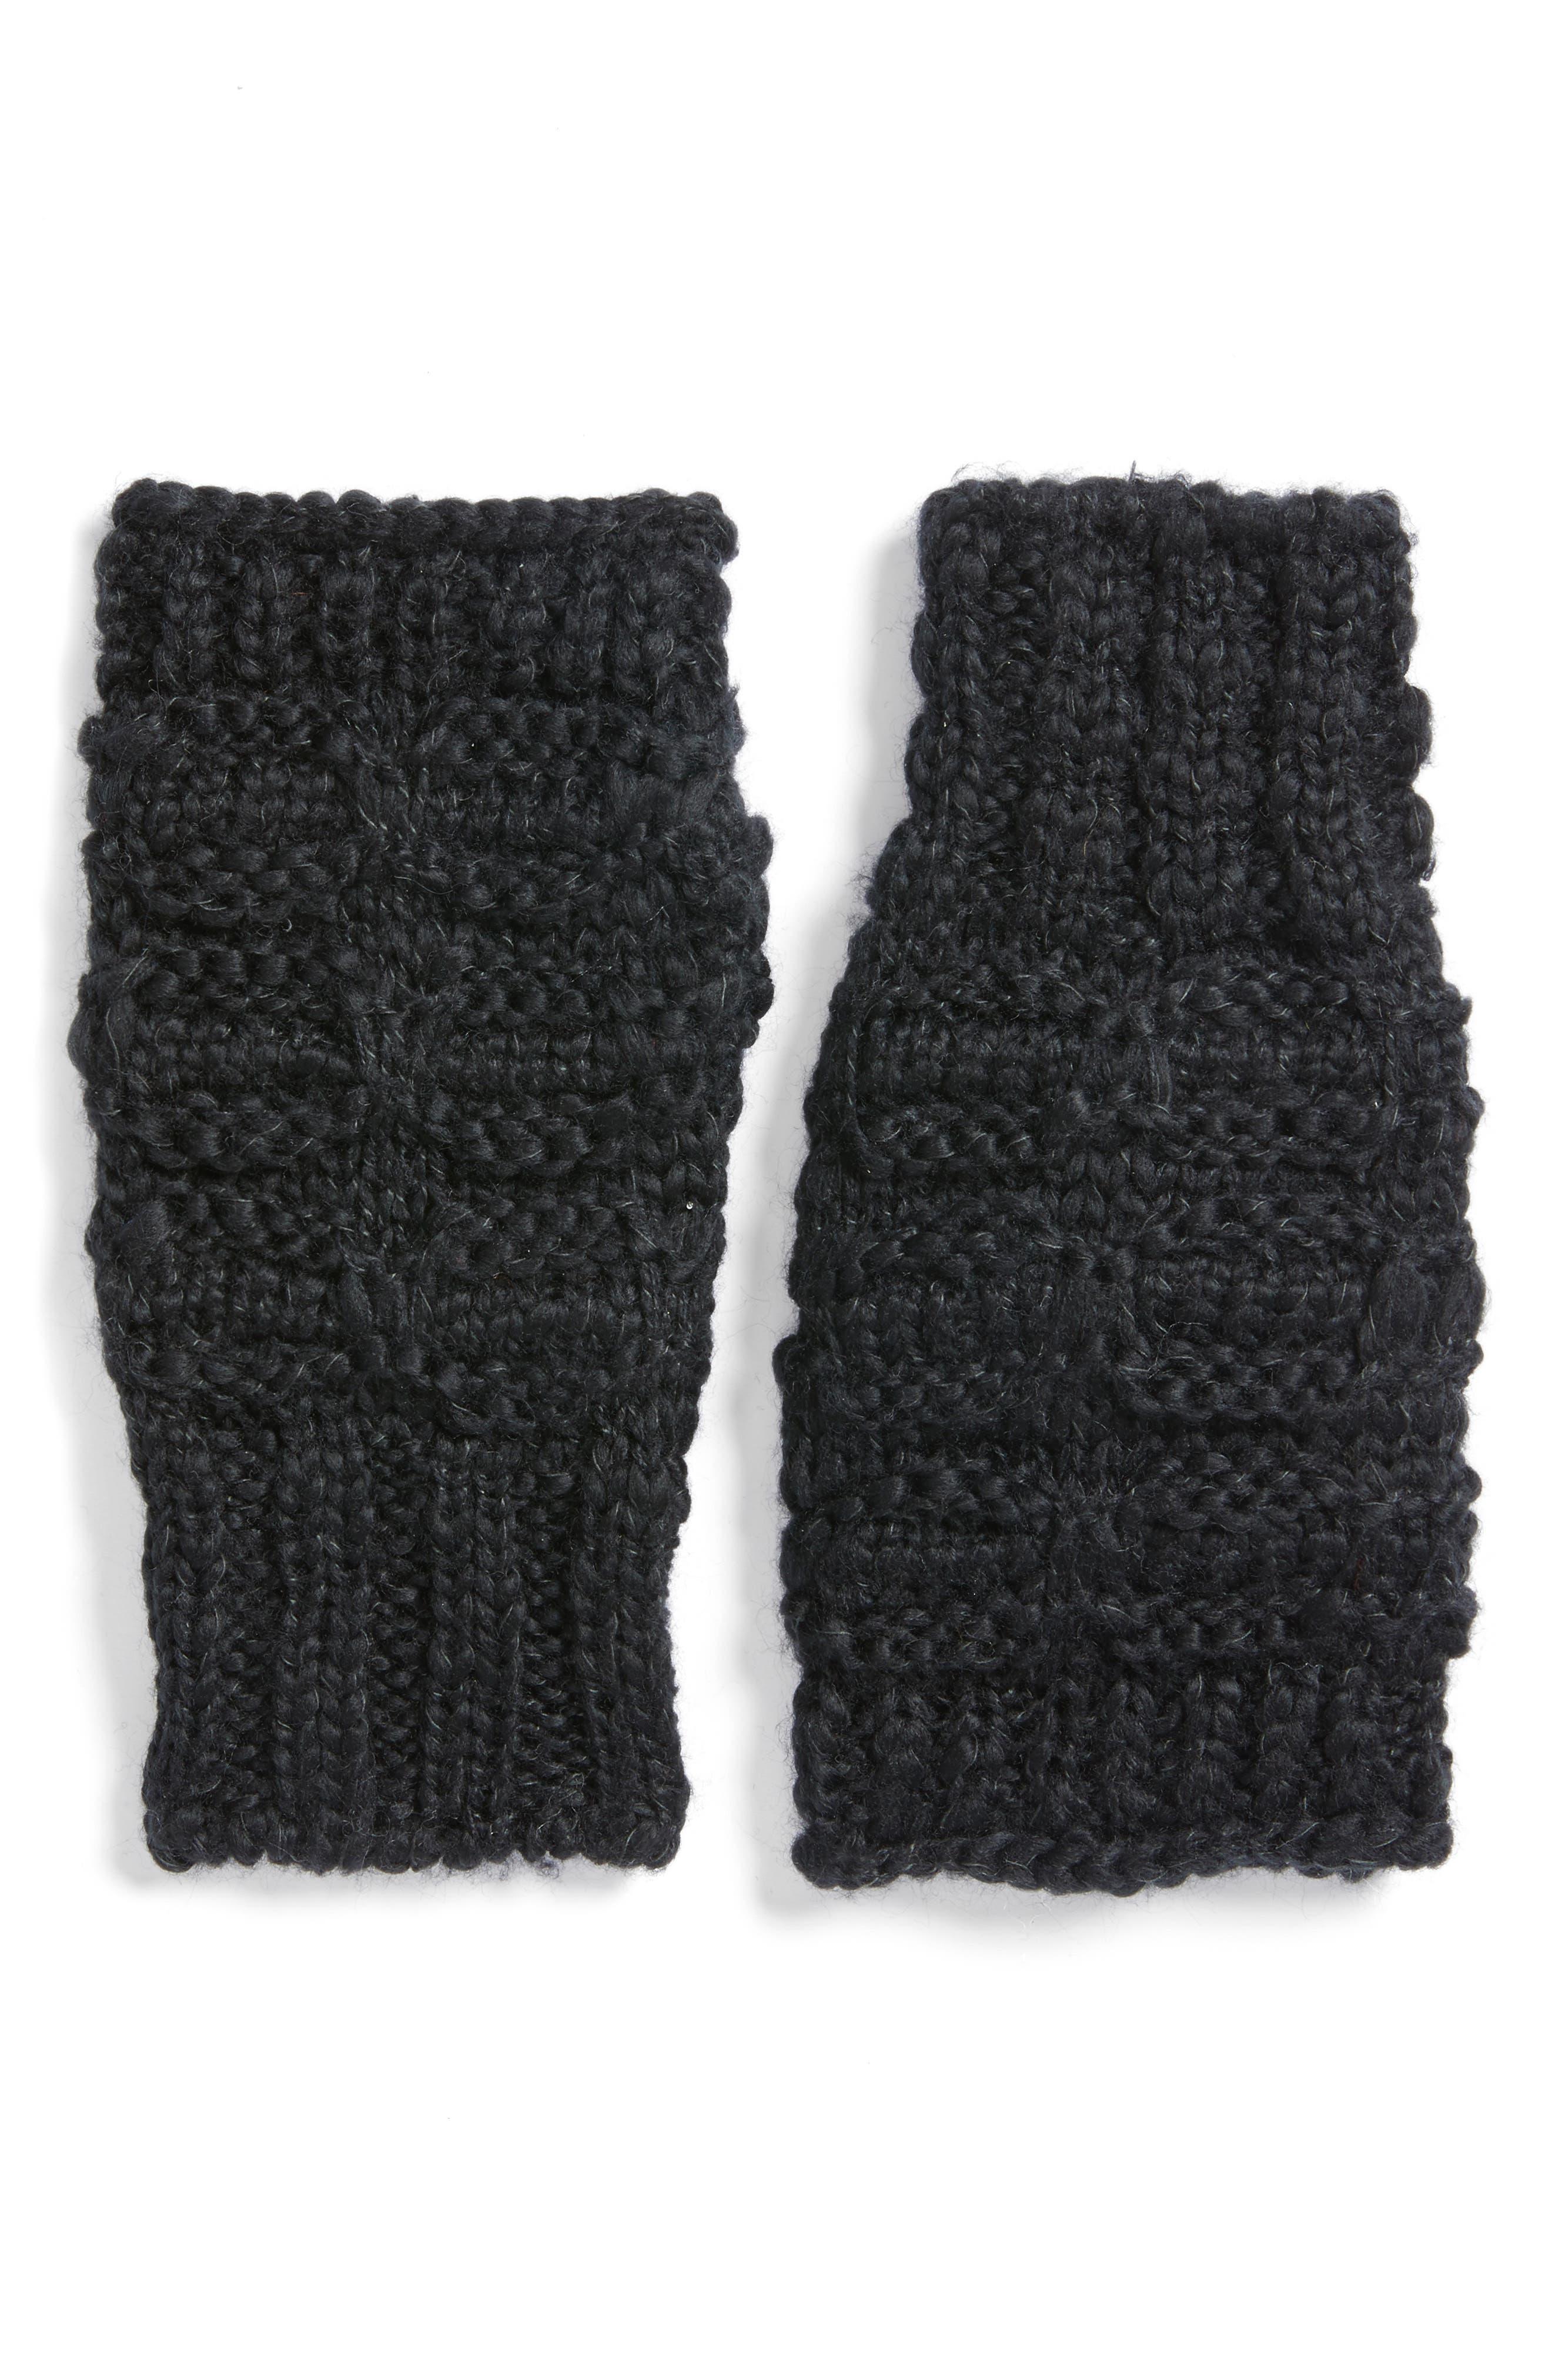 Main Image - Treasure & Bond Chunky Knit Arm Warmers